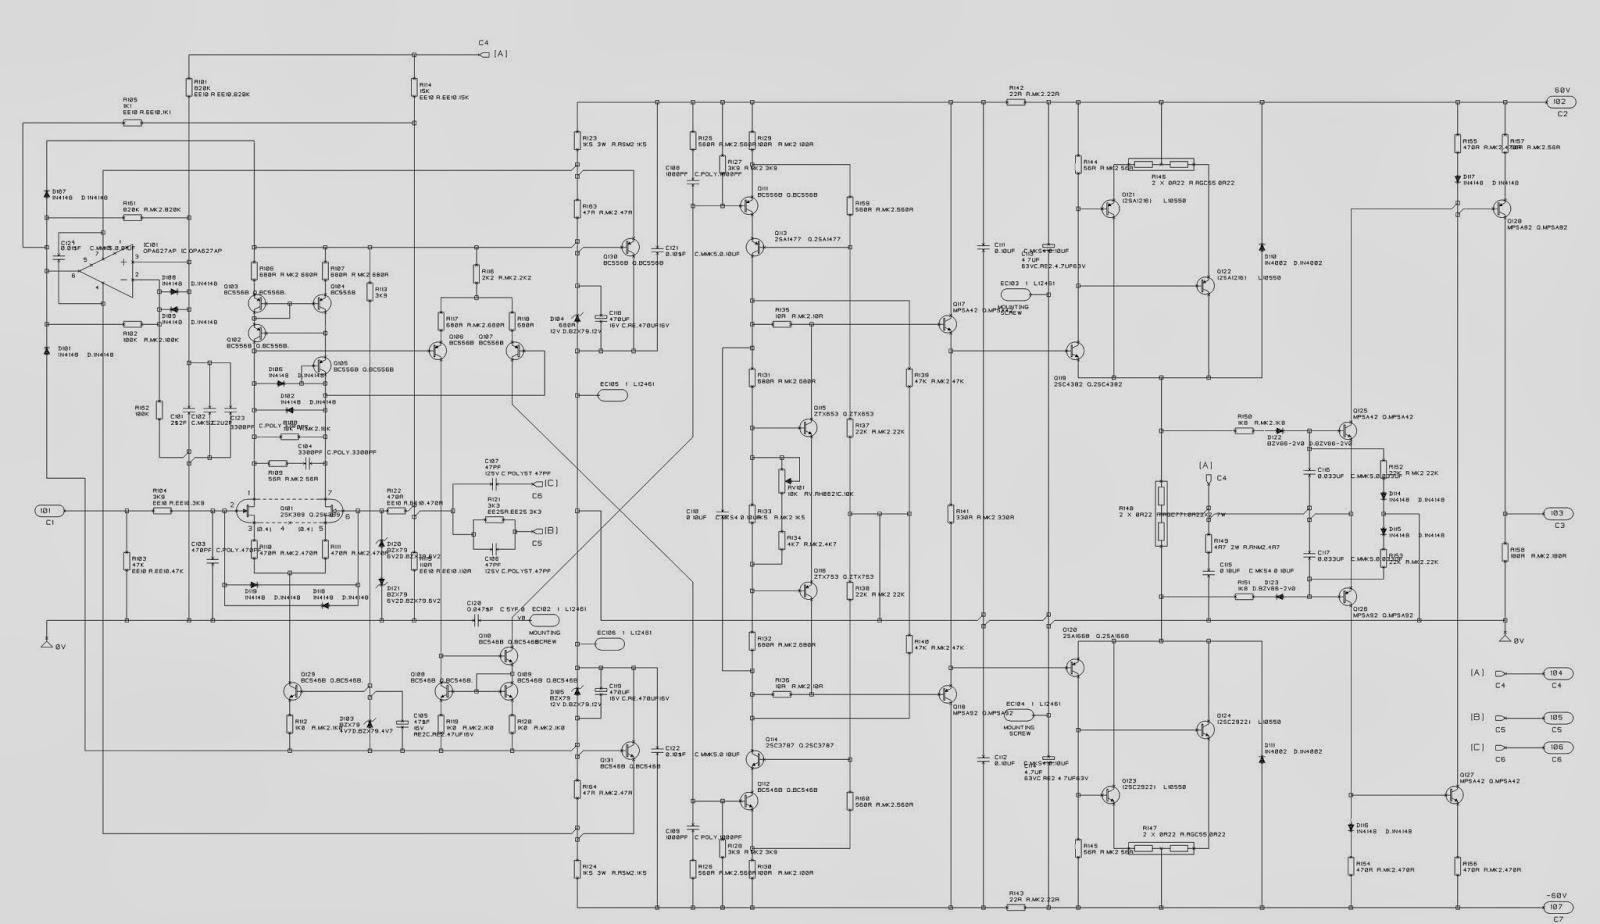 5000 watt amplifier circuit diagram 1984 jeep cj7 dash wiring 5000w audio power bing images